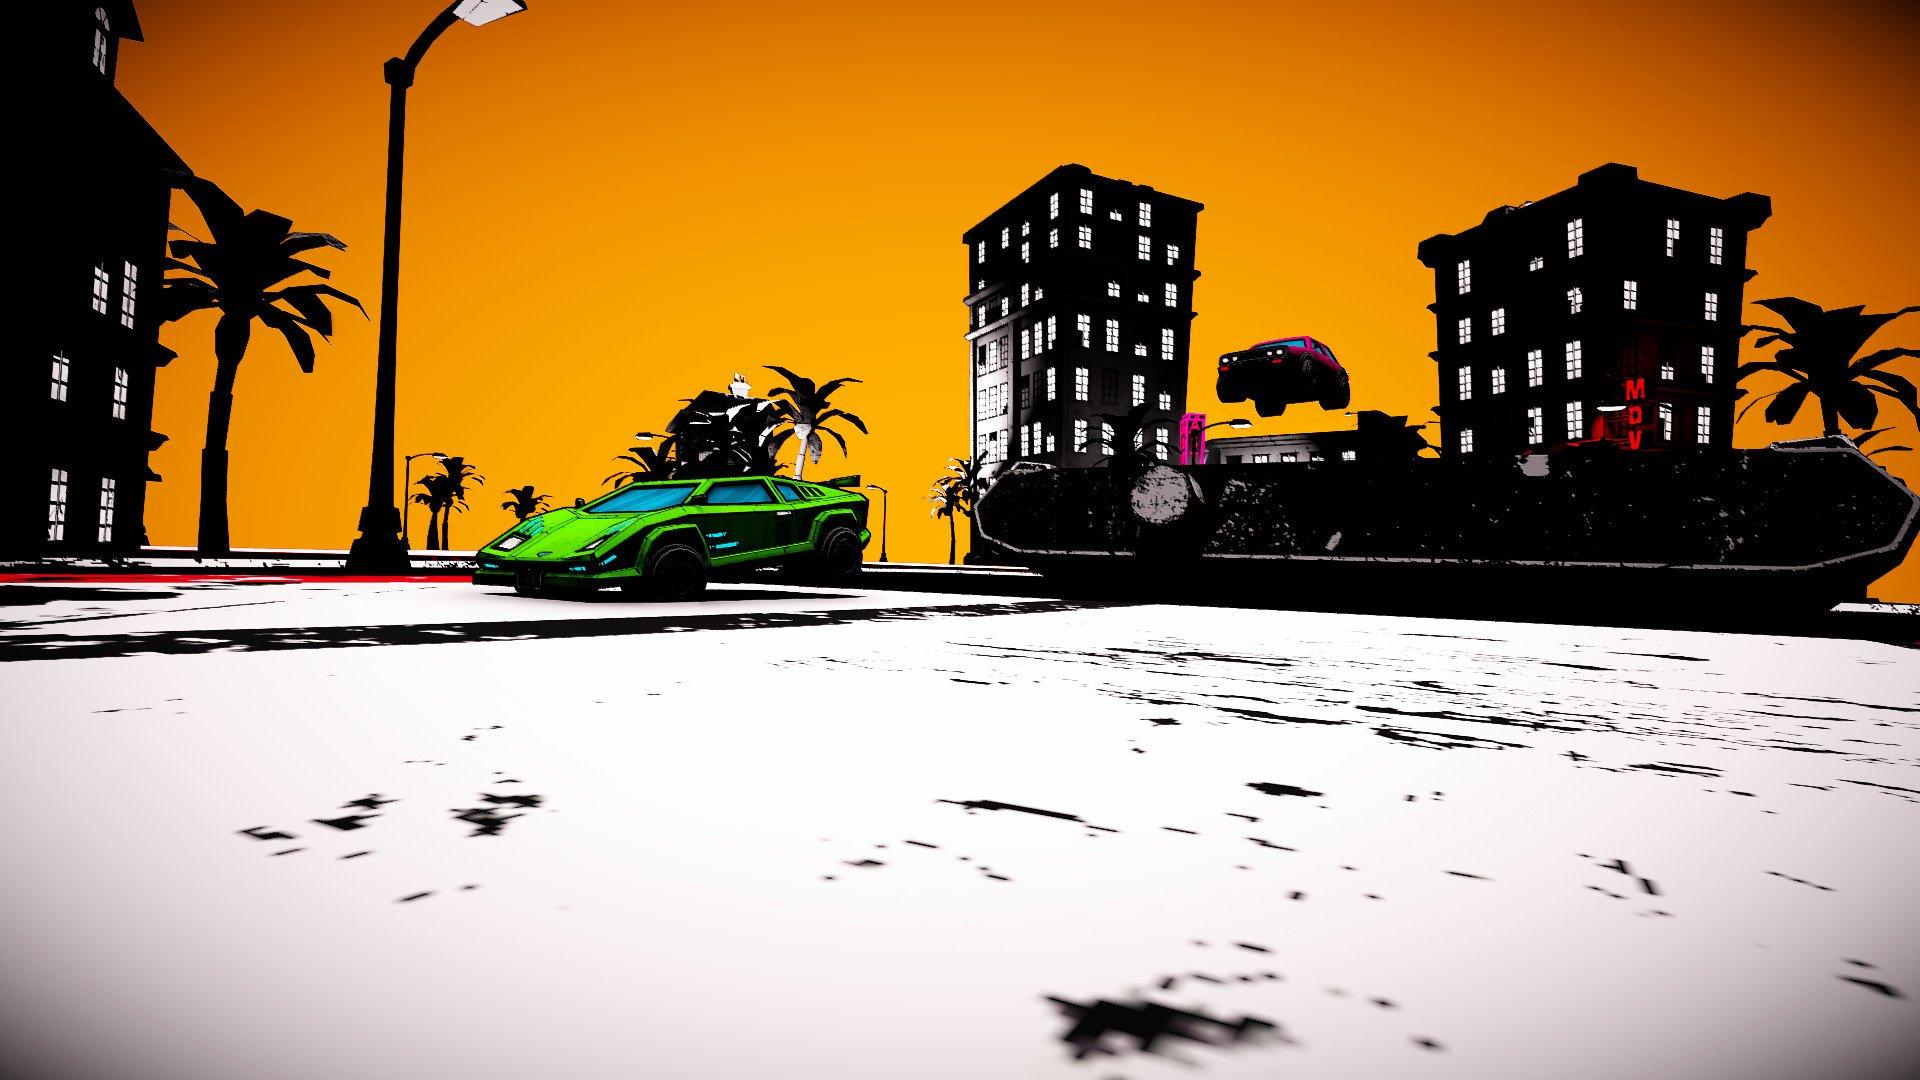 Street Heat 8